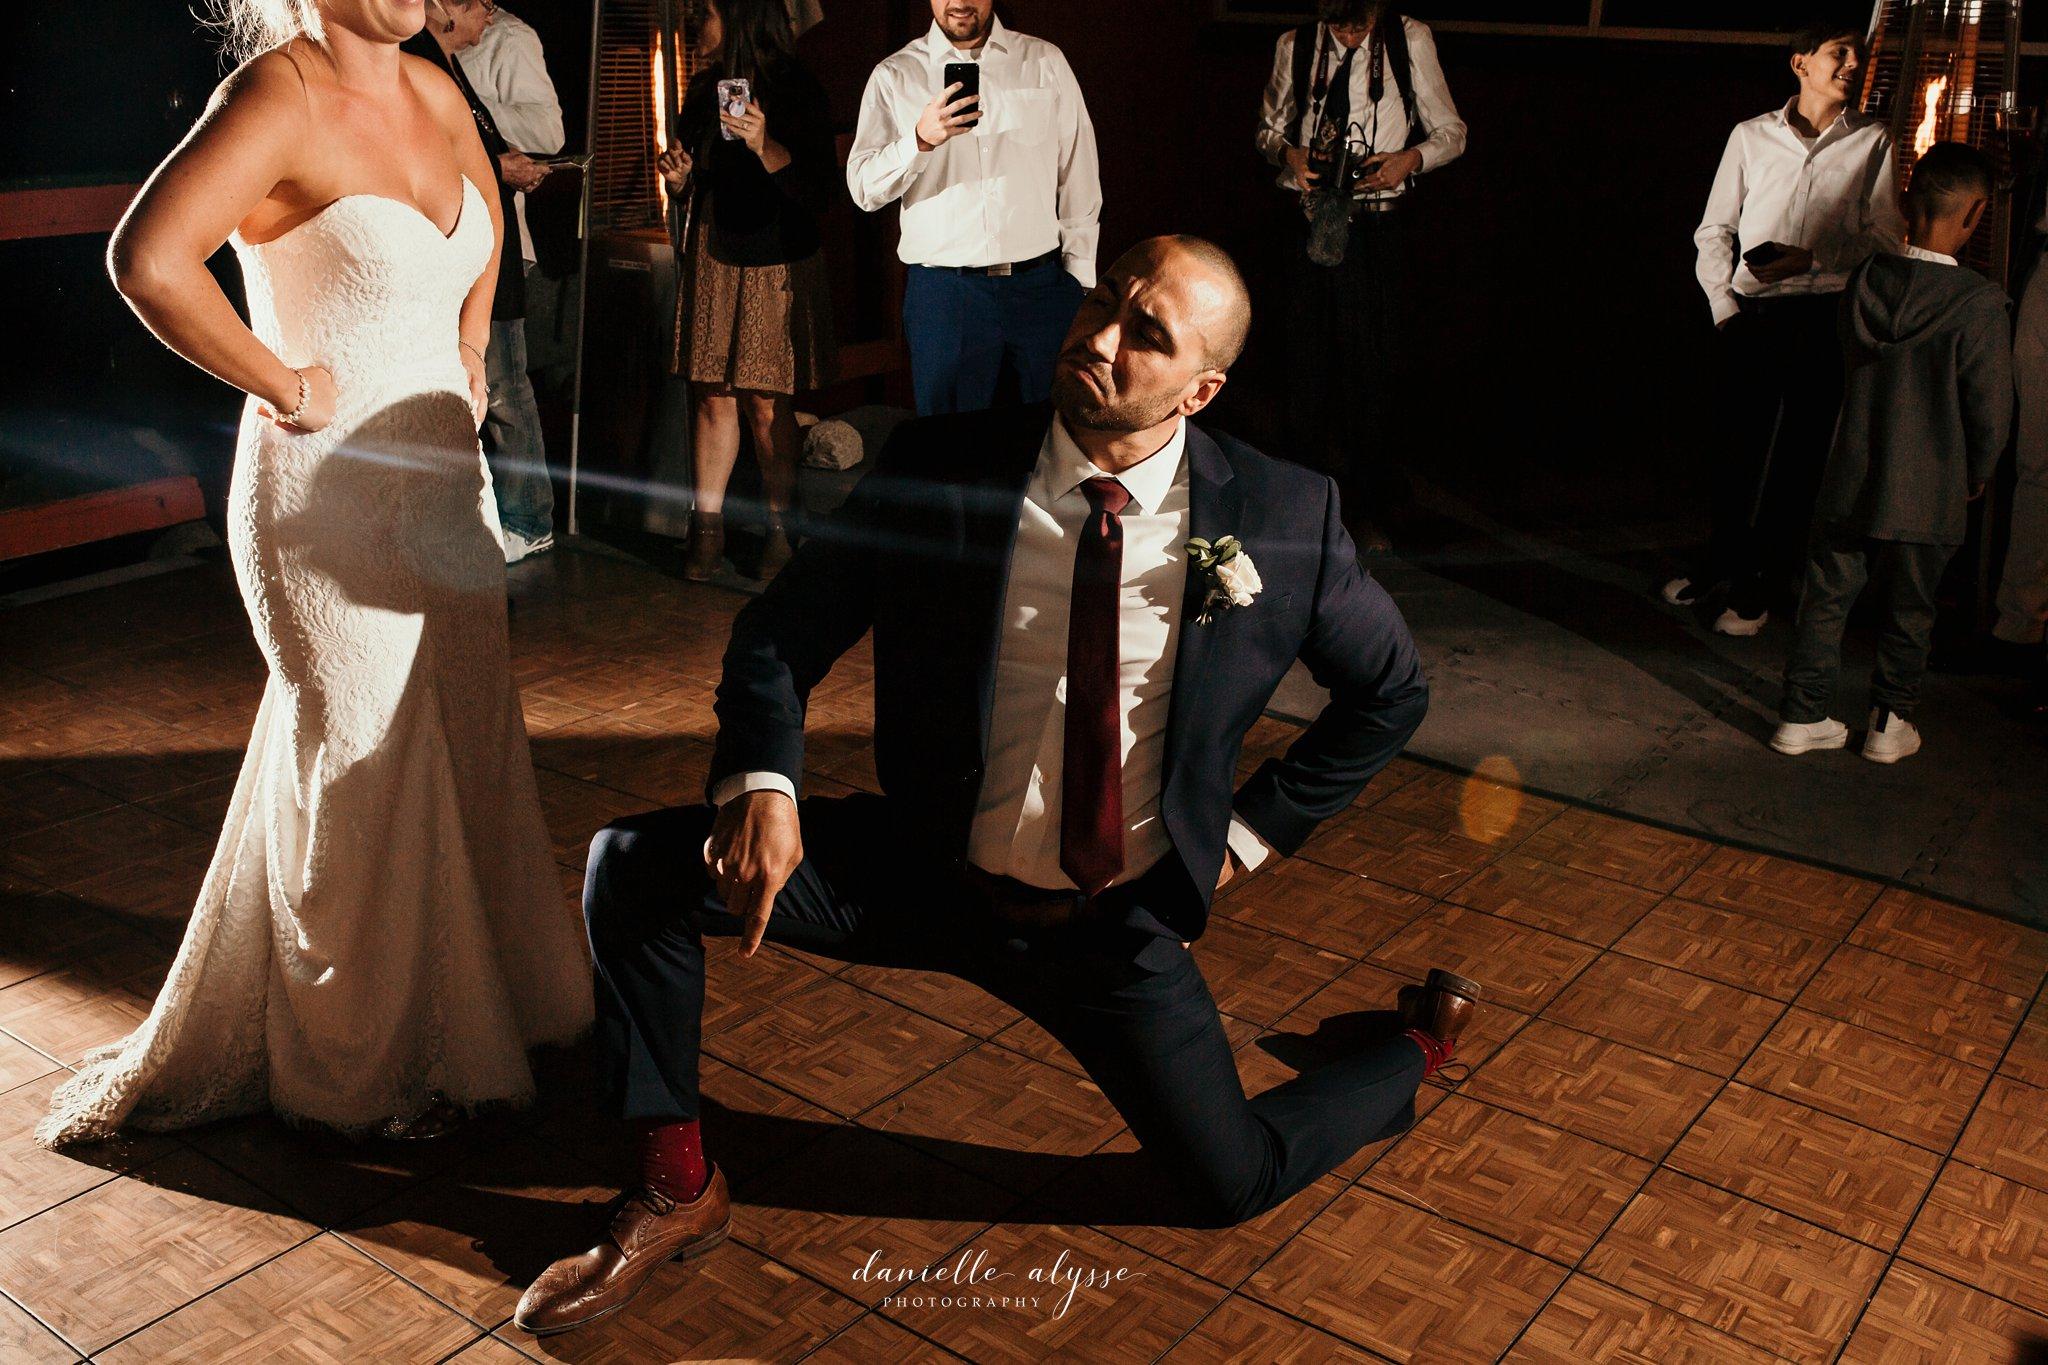 180831_wedding_stephanie_heavenly_south_lake_tahoe_danielle_alysse_photography_destination_blog_1168_WEB.jpg